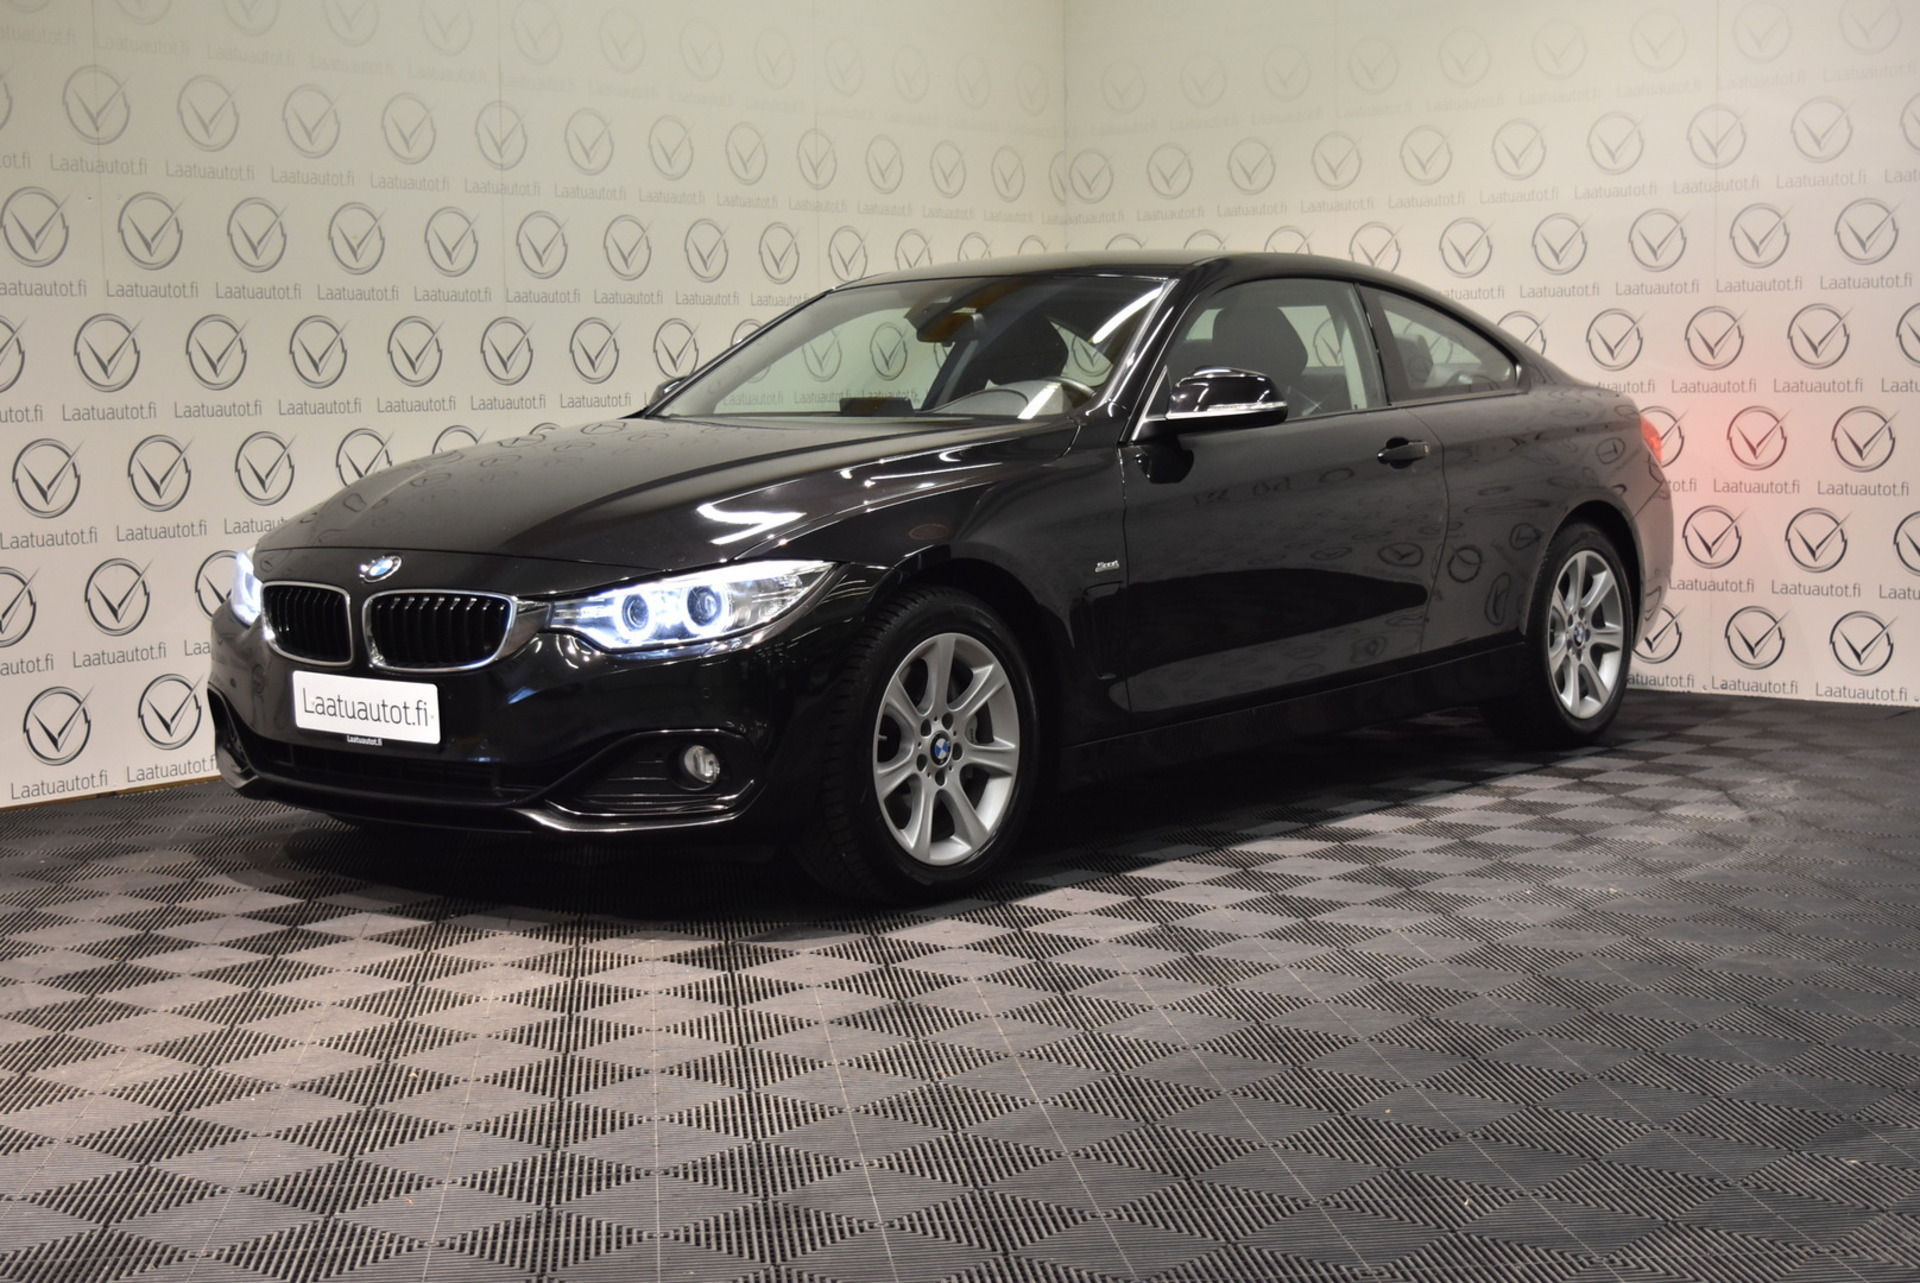 BMW 435 F32 Coupe 435d A xDrive Business Sport - Korko: 1, 89% + kulut! Jopa ilman käsirahaa! Urheiluistuimet,  Prof.Navi,  PDC,  Nahkasisusta!